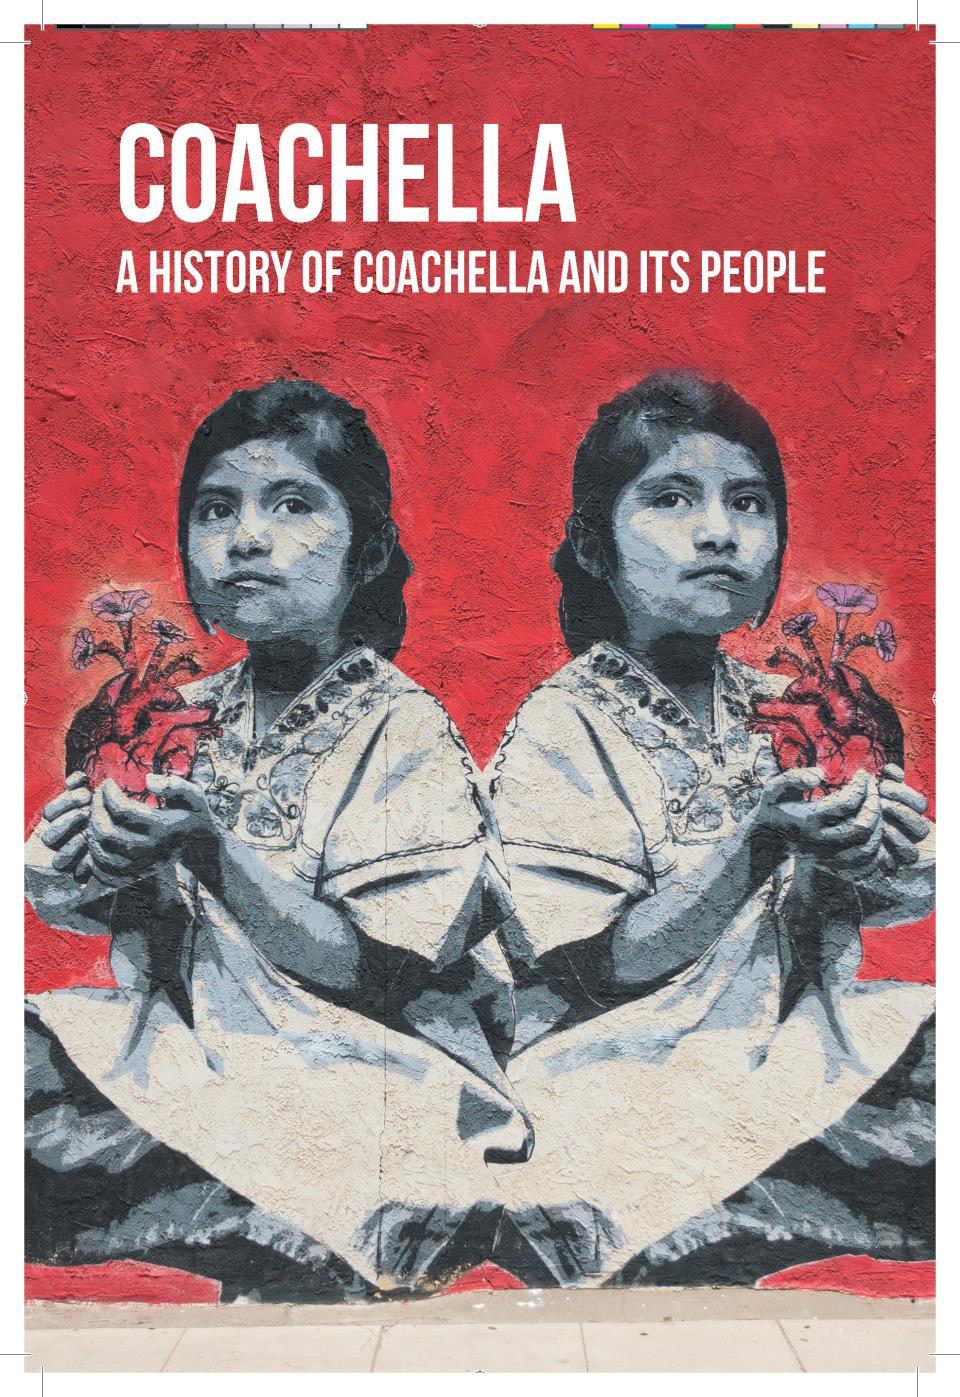 Coachella History English cover